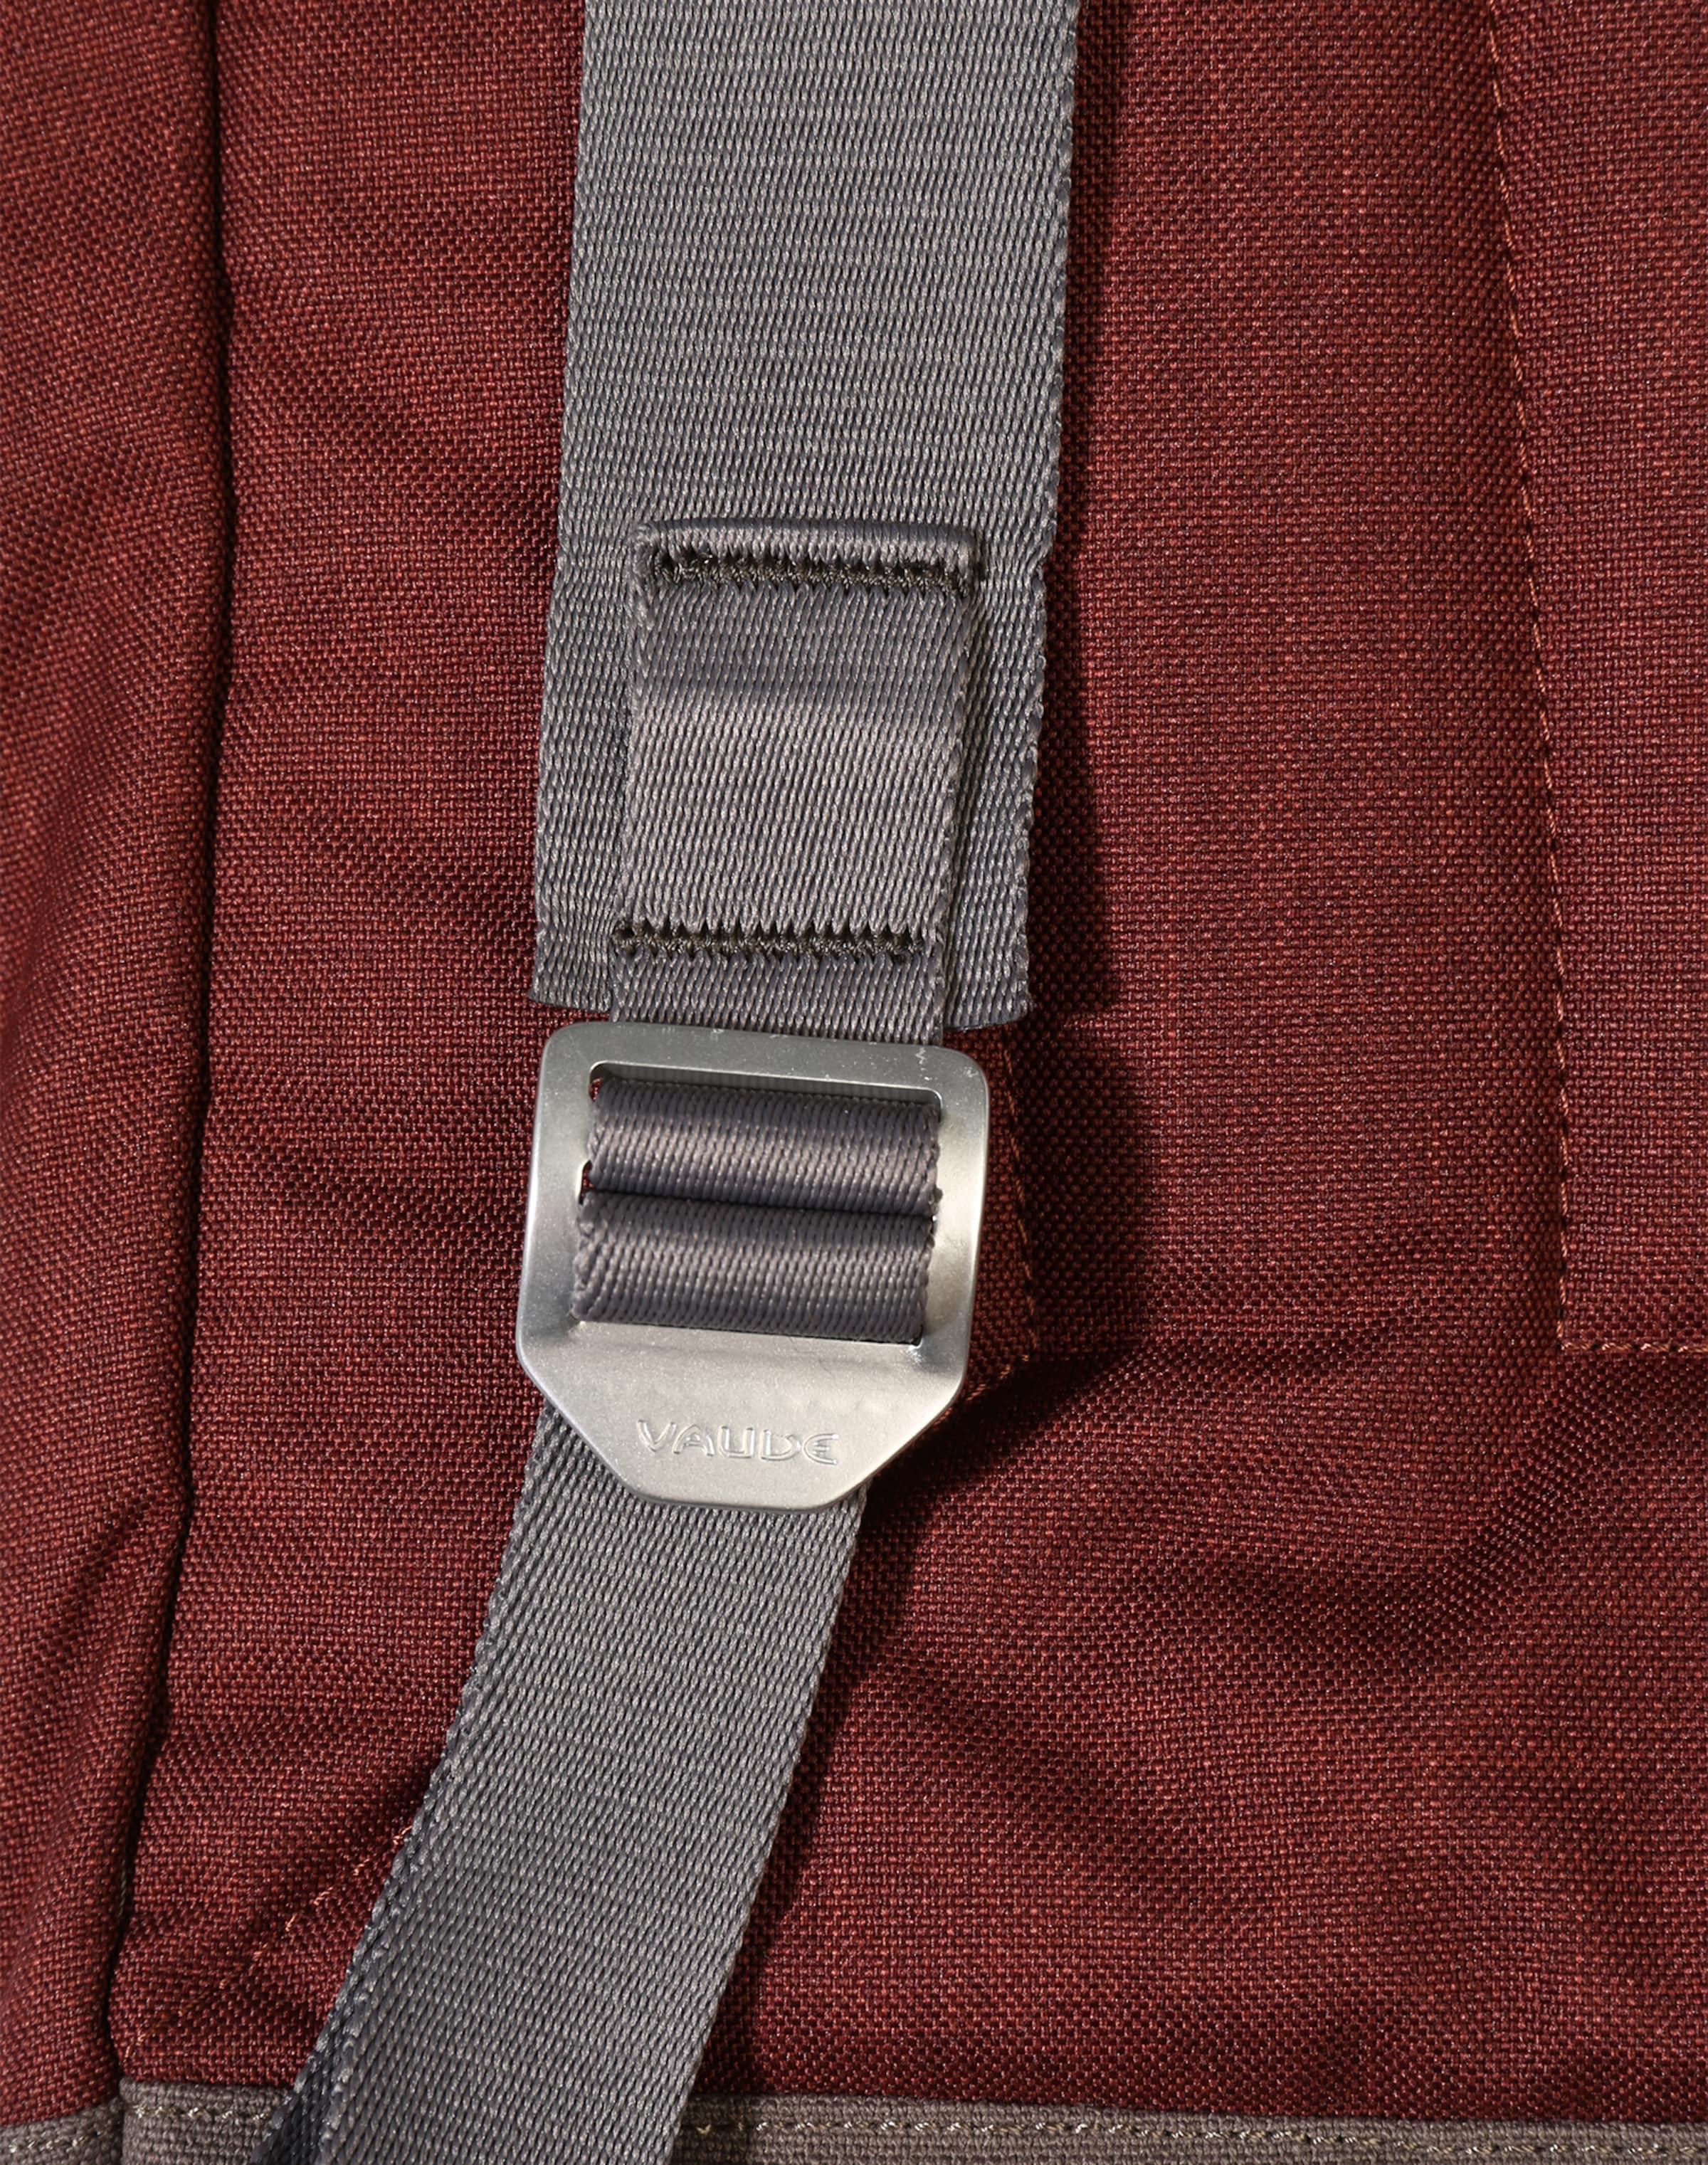 VAUDE Rucksack 'Consort Mini' Niedriger Versand Mode-Stil Online-Verkauf Billig Verkauf Footlocker Finish Billig Verkauf Besuch HD0sUW